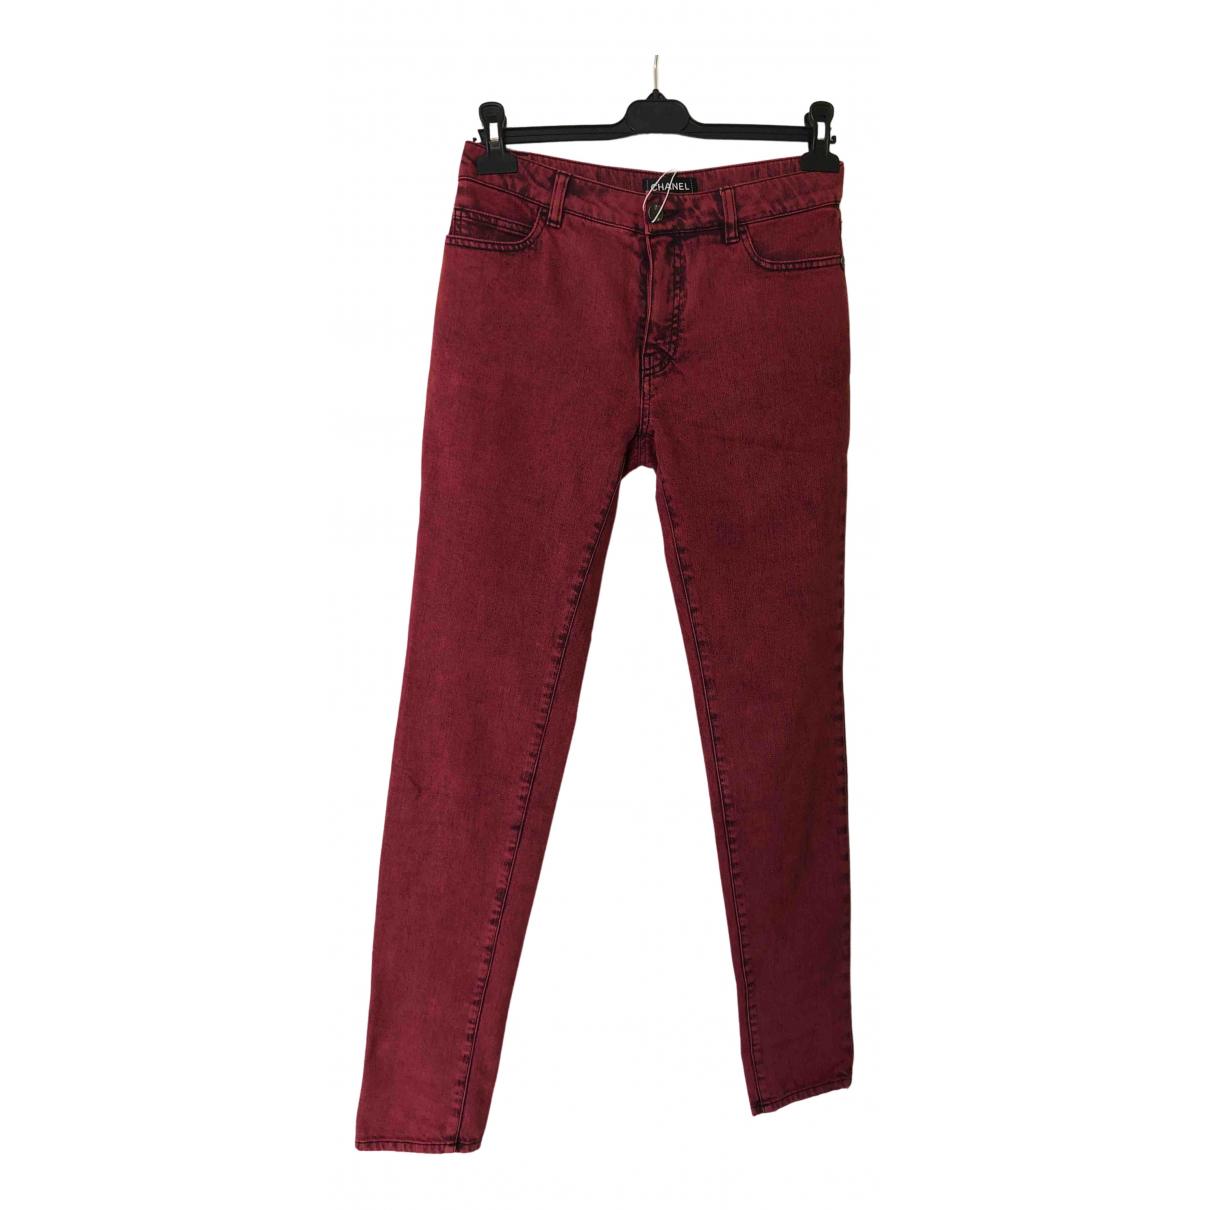 Chanel \N Burgundy Cotton - elasthane Jeans for Women 40 FR